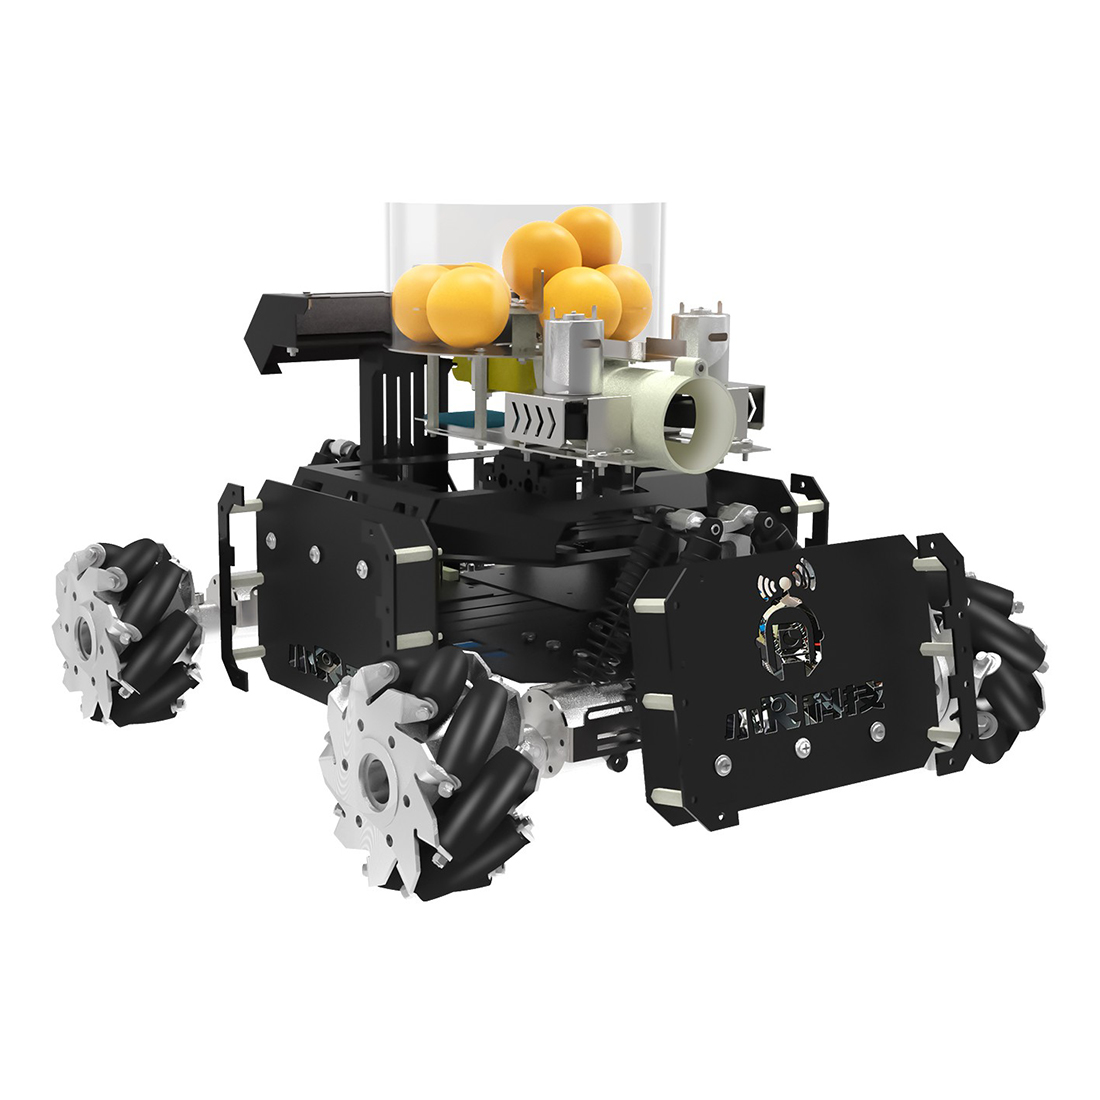 DIY Steam Omni Wheel Turret Chariot VR Video Control XR Master Robot For STM32 Children Developmental Educational Toys - Black